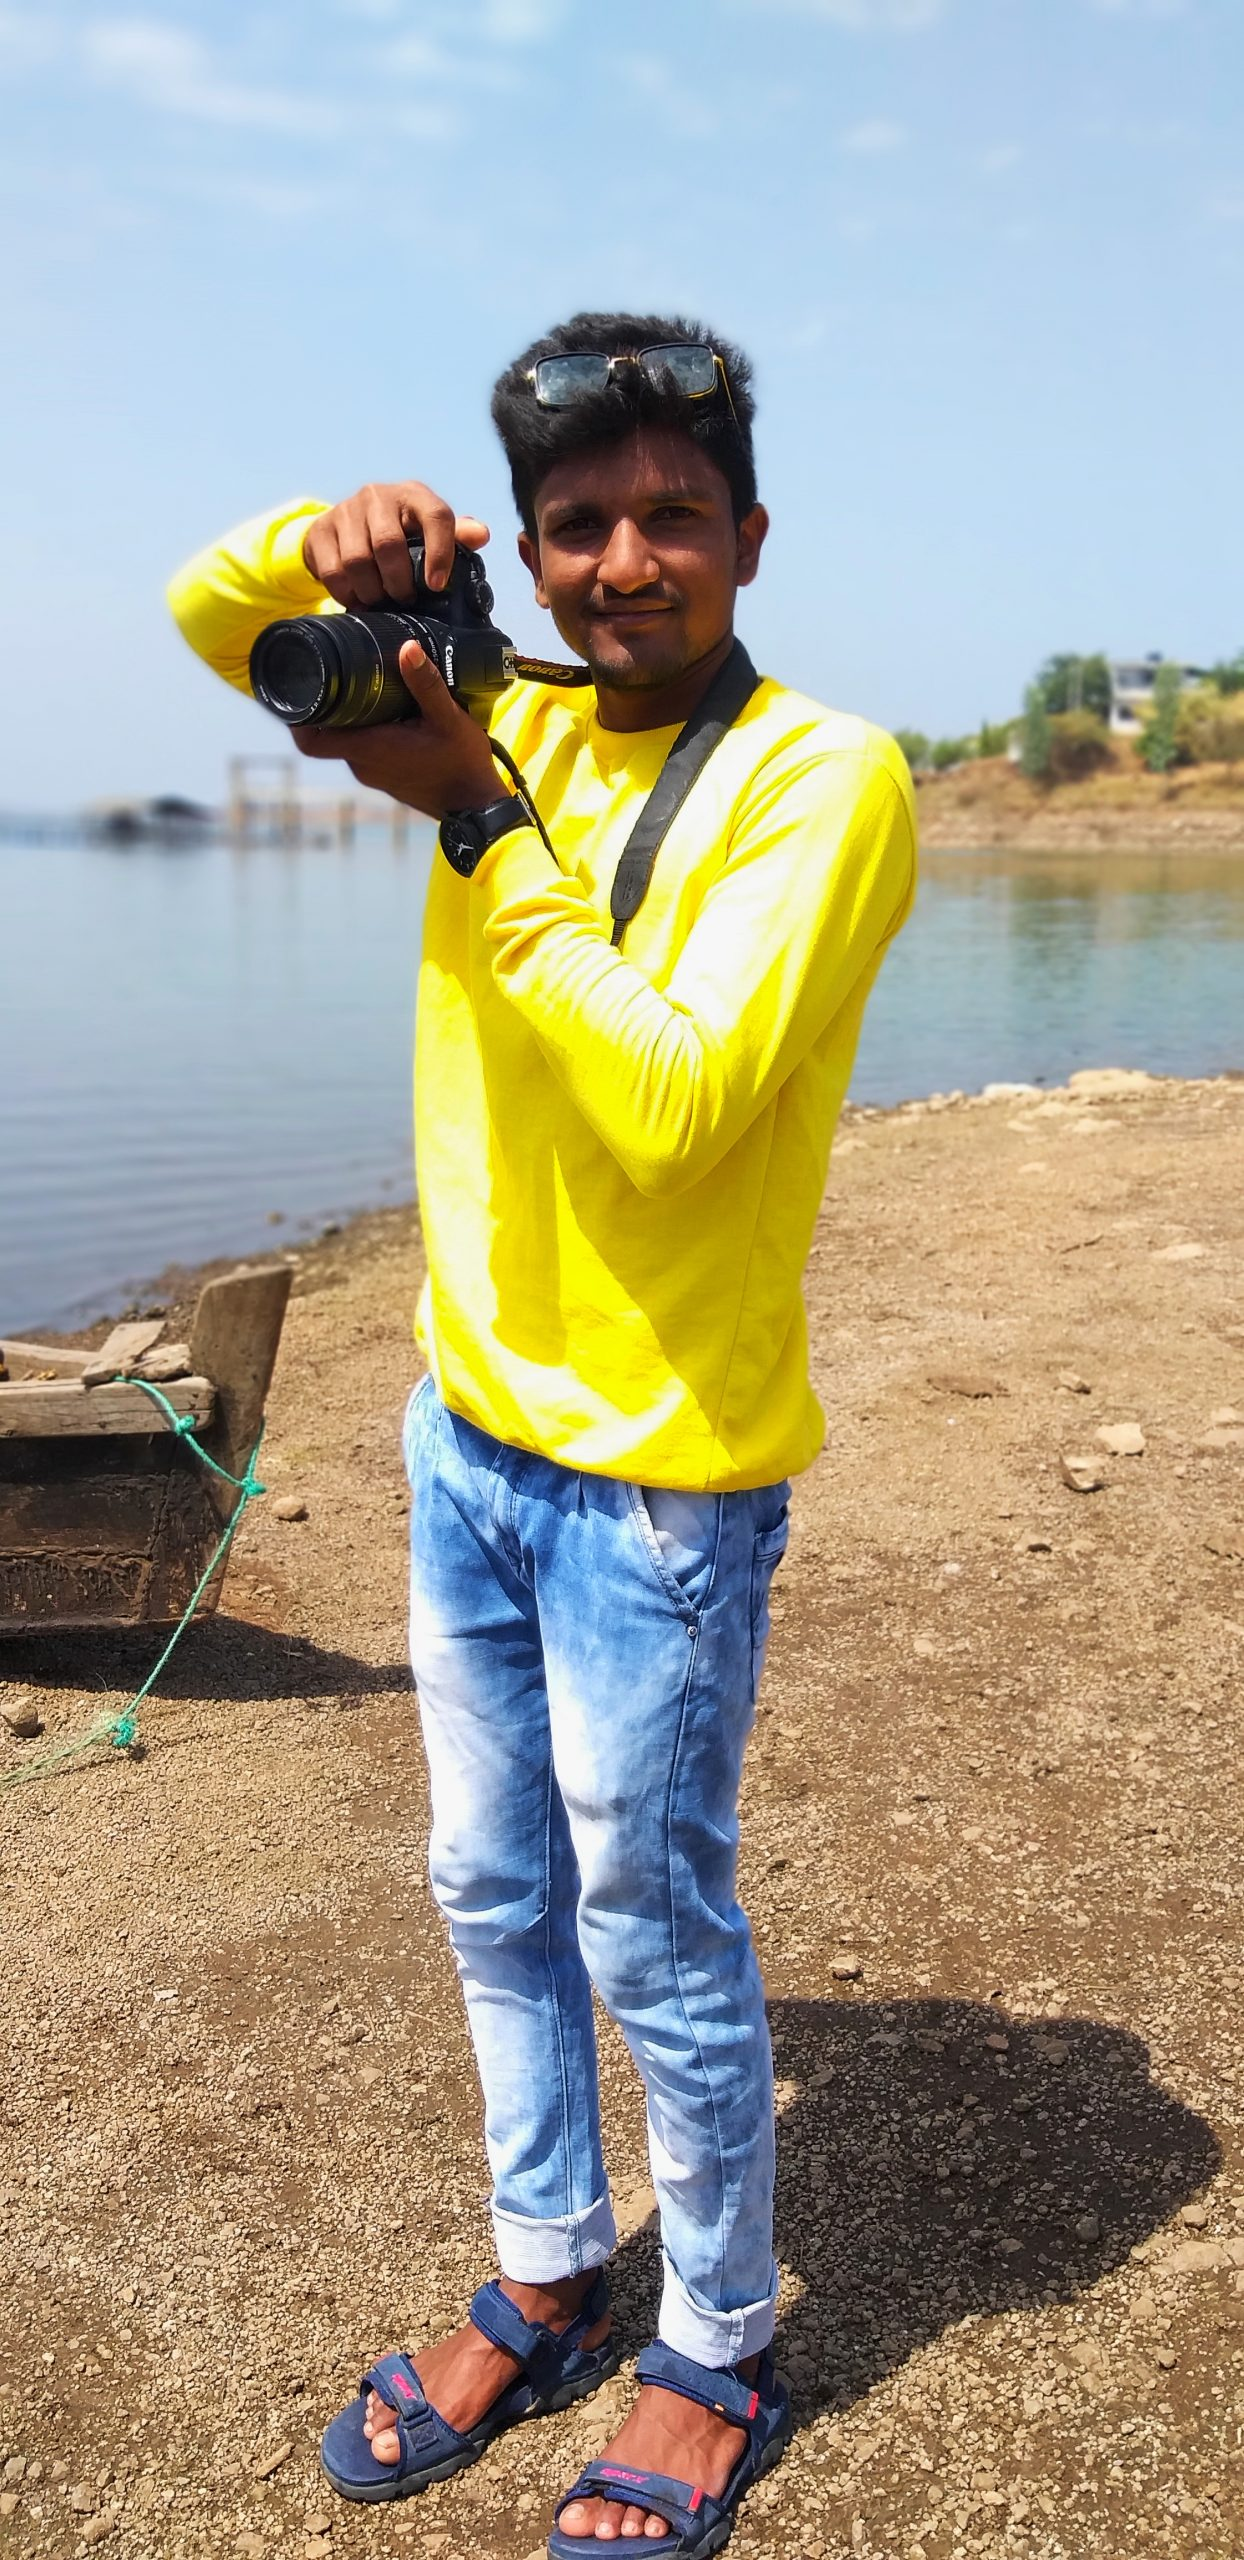 Boy posing with camera